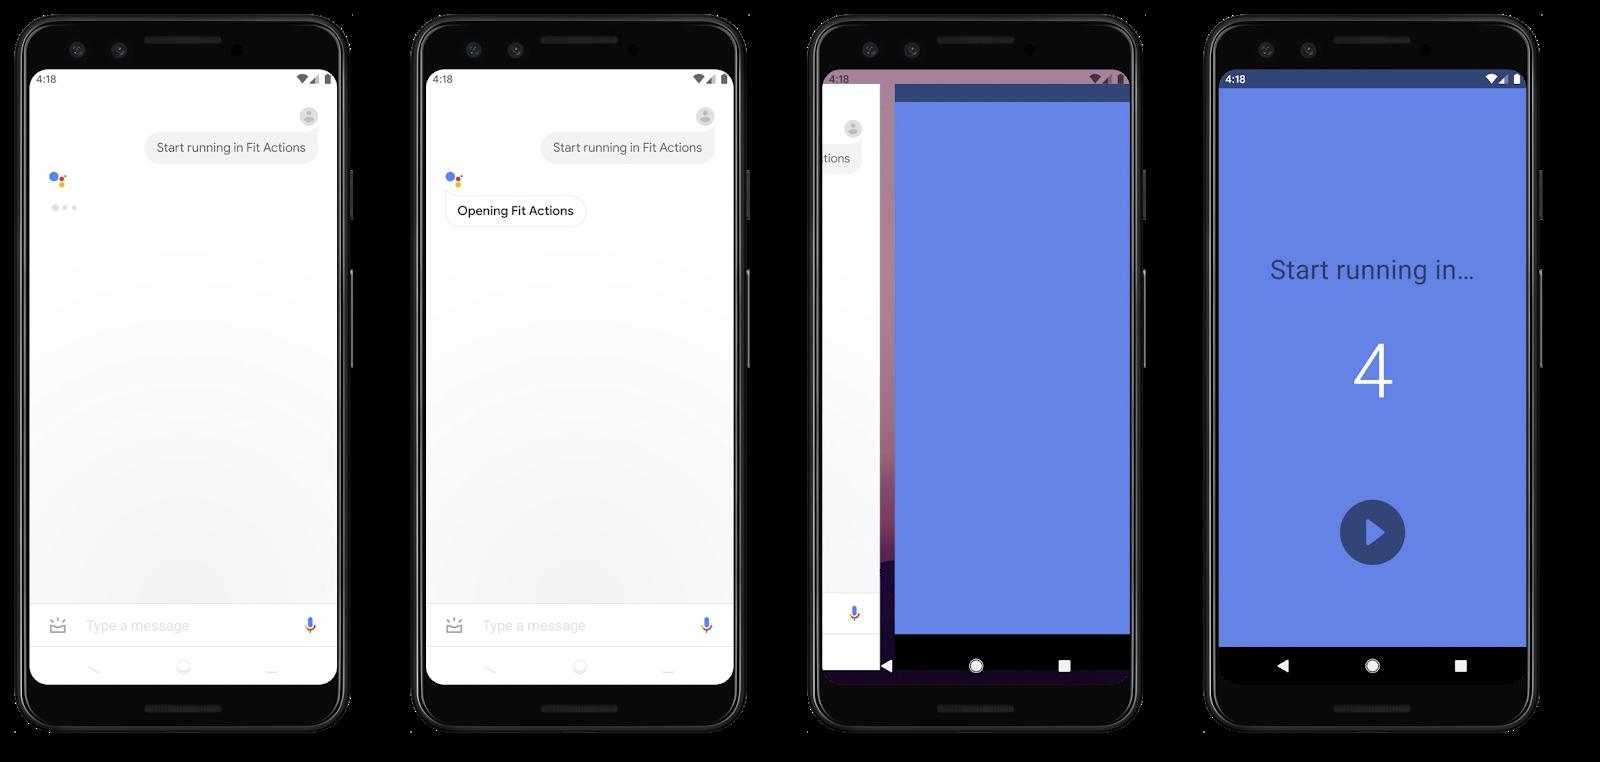 Google アシスタントを使用して、アプリ内のランニング トラッカーを起動する様子を順番に表す 4 つの画面。